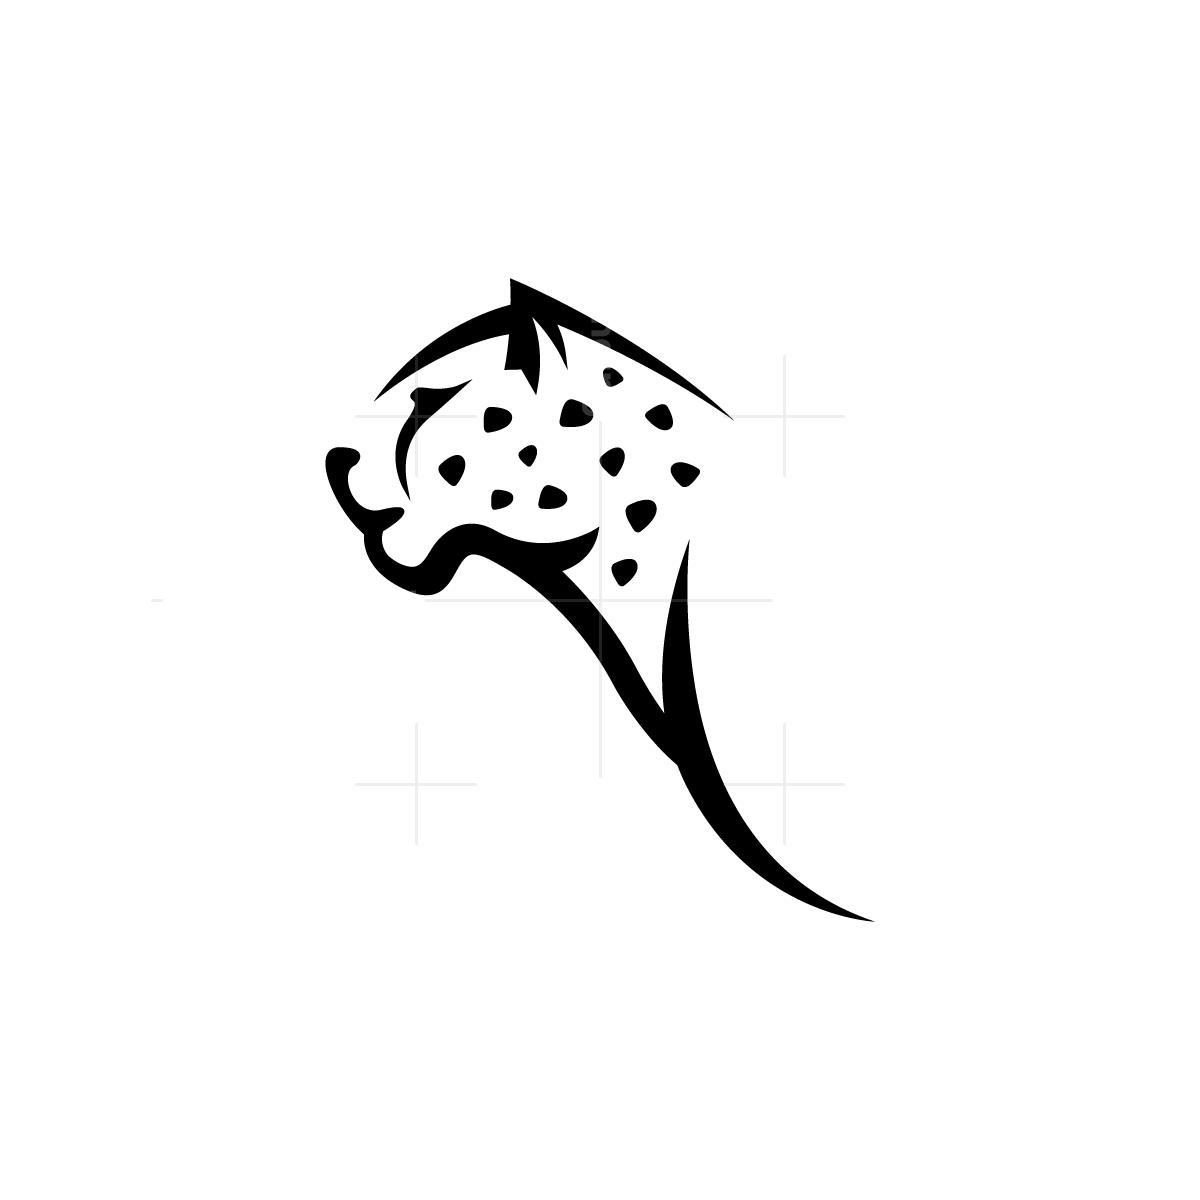 cheetah logo in 2020 cheetah logo horse logo bull logo cheetah logo horse logo